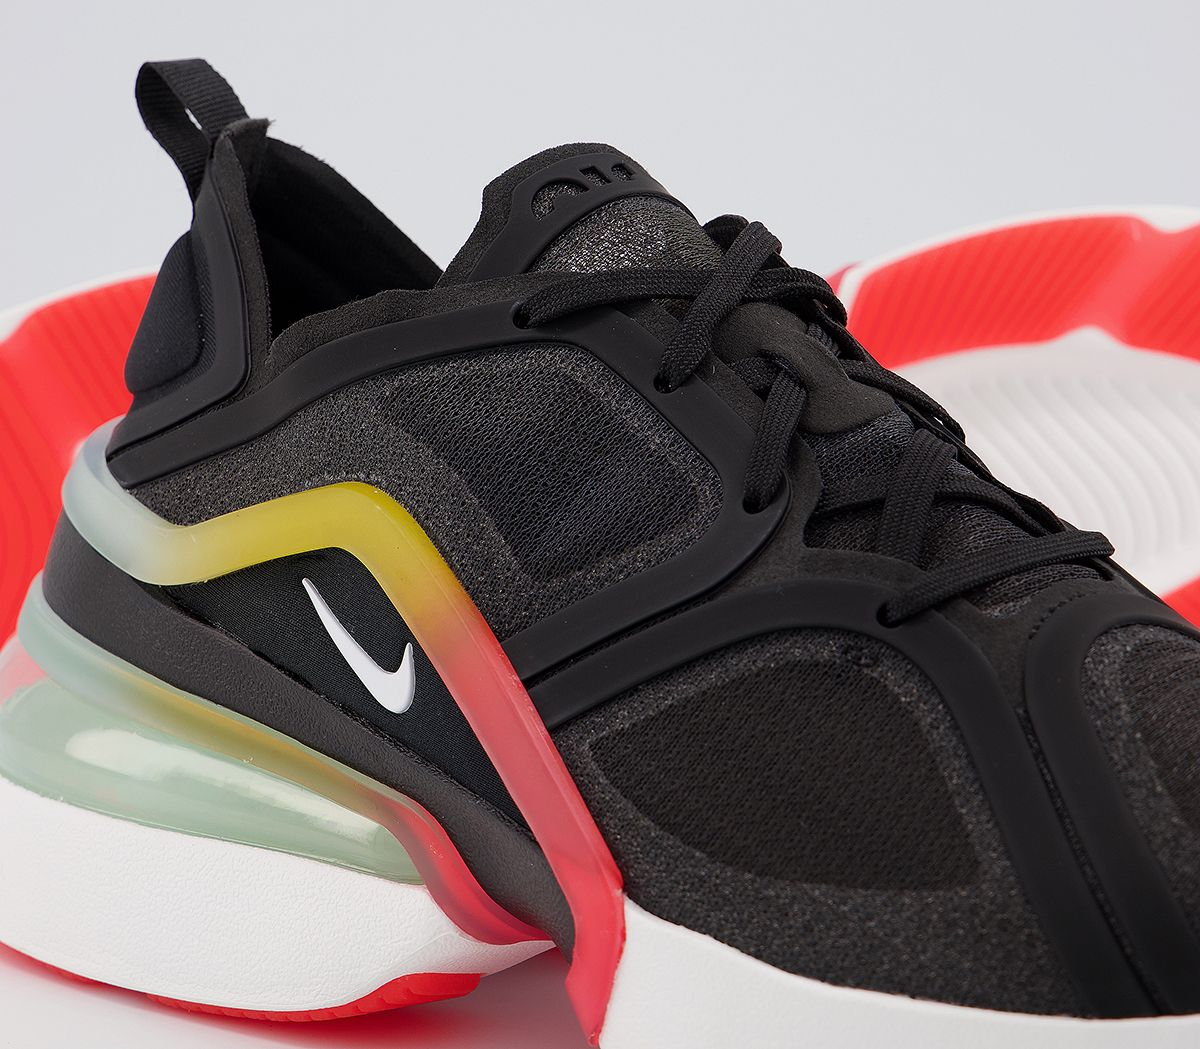 Nike Trainers Air Max 270 Xx Trainers Black White Bright